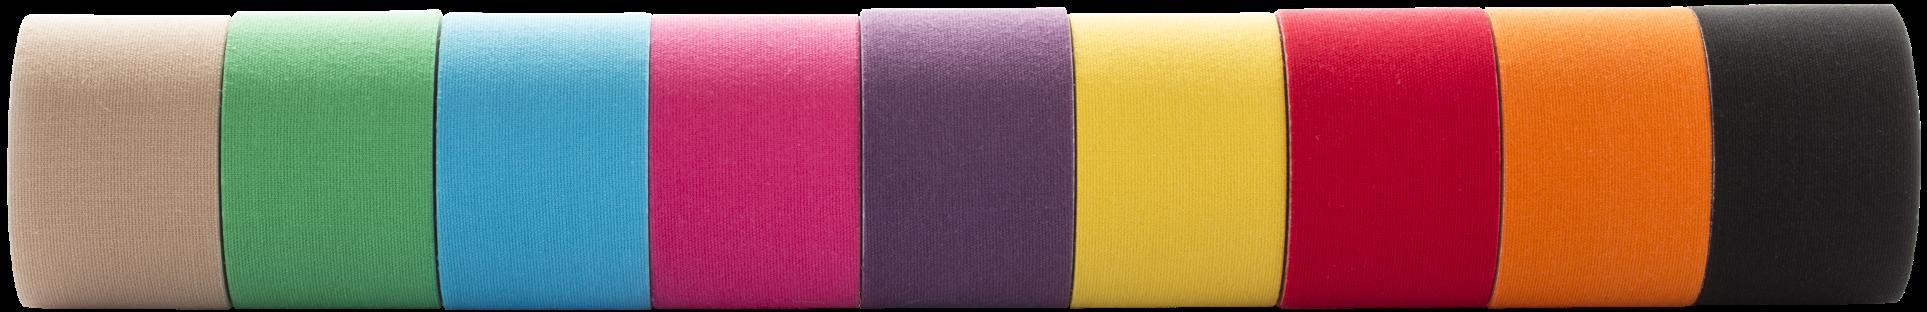 Kinesio Tape verschiedene Farben, Kinesio Tape blau, kinesio tape beige, kinesio tape rot